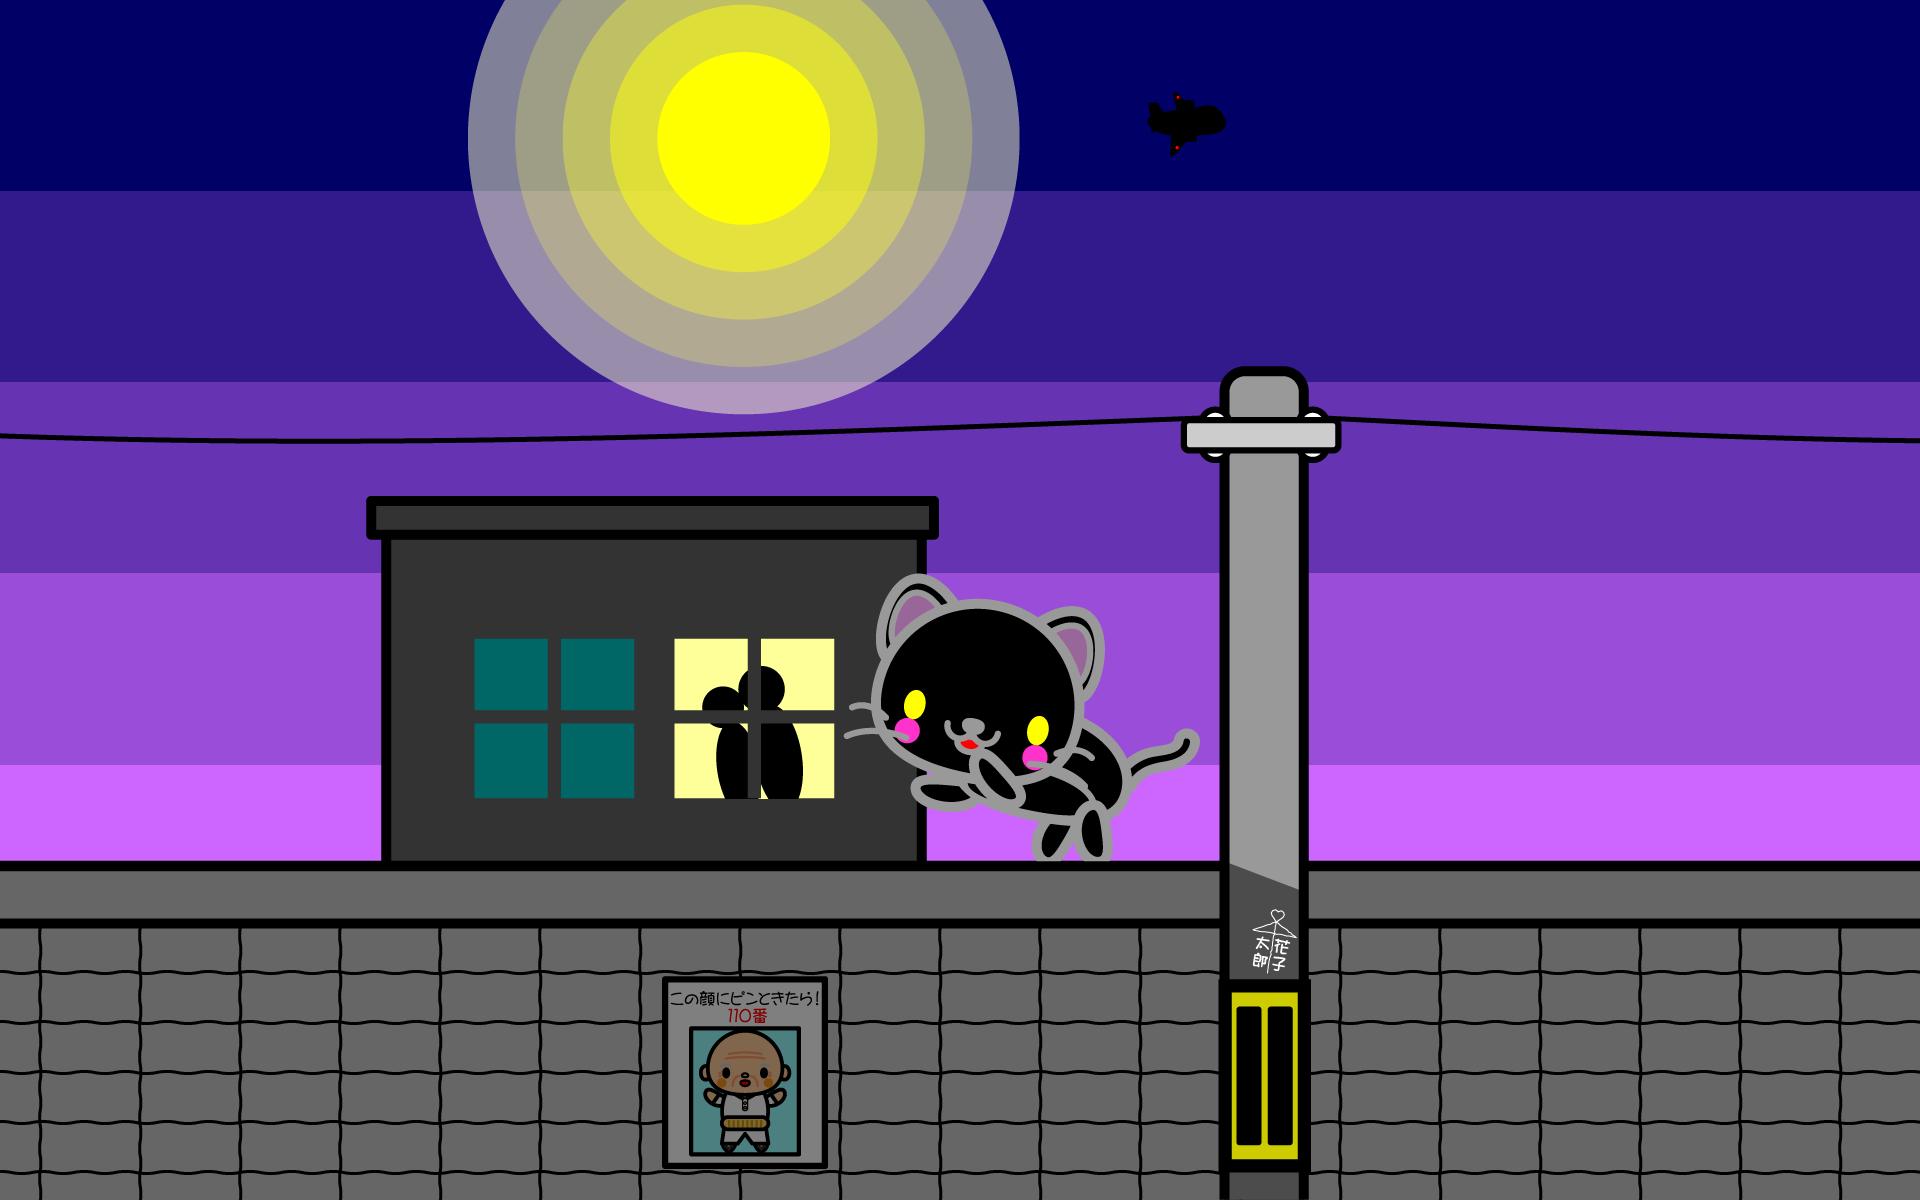 wallpaper1_blackcat-playful-pc